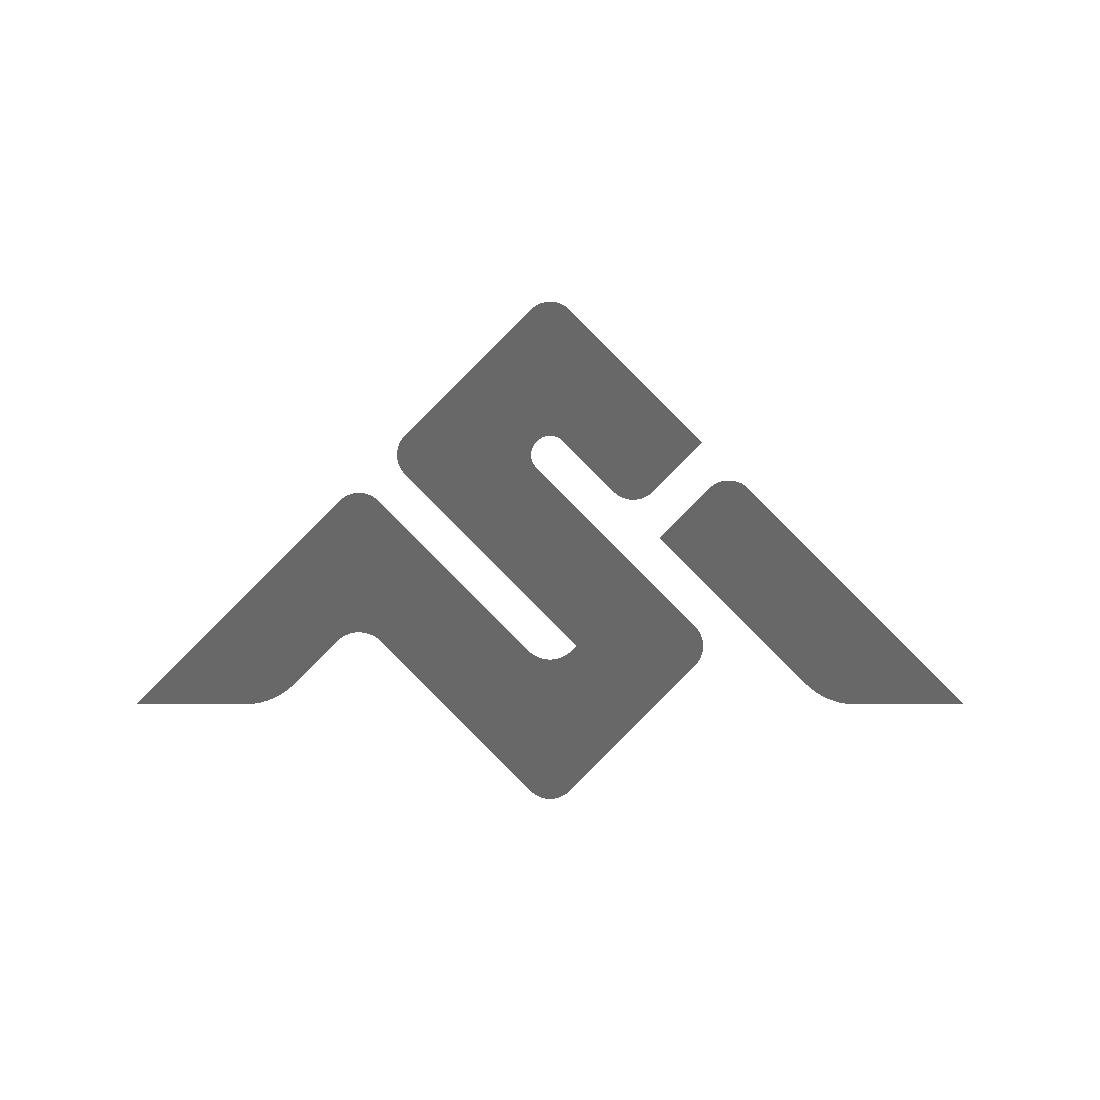 Ski Fond Magasin De Achat Shop Salomon 8 Equipe Skating Chaussures vZawxZ